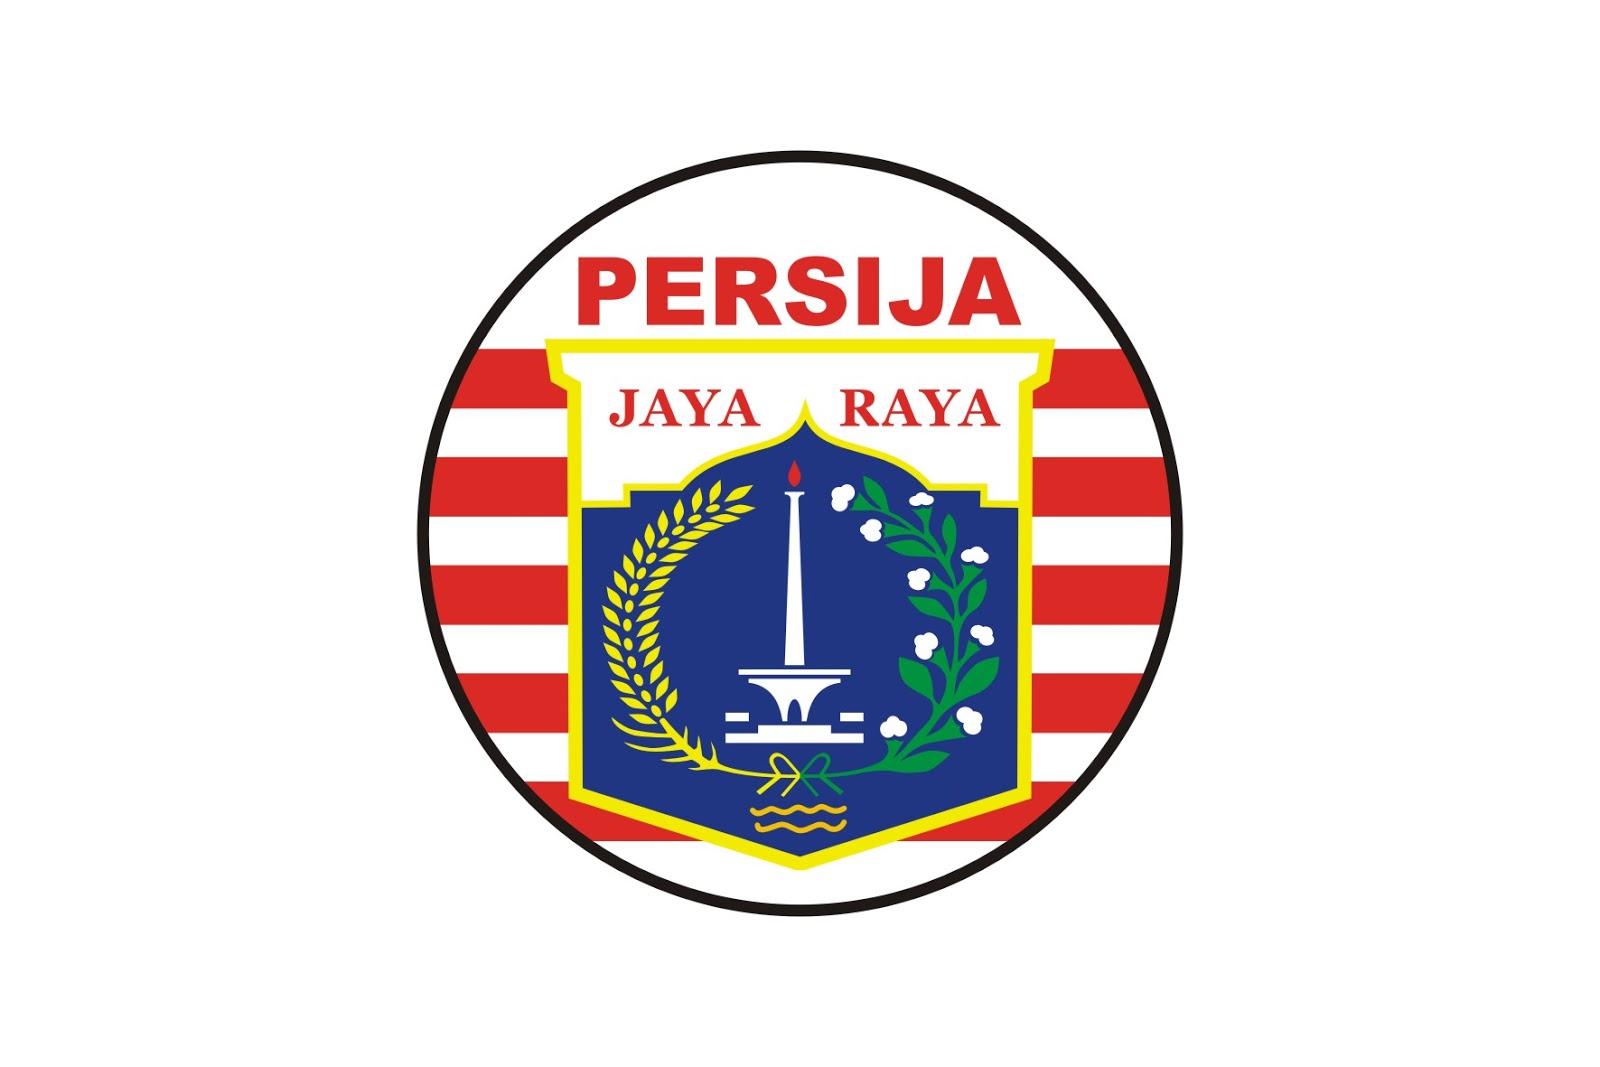 Persija Logo   Logo Share